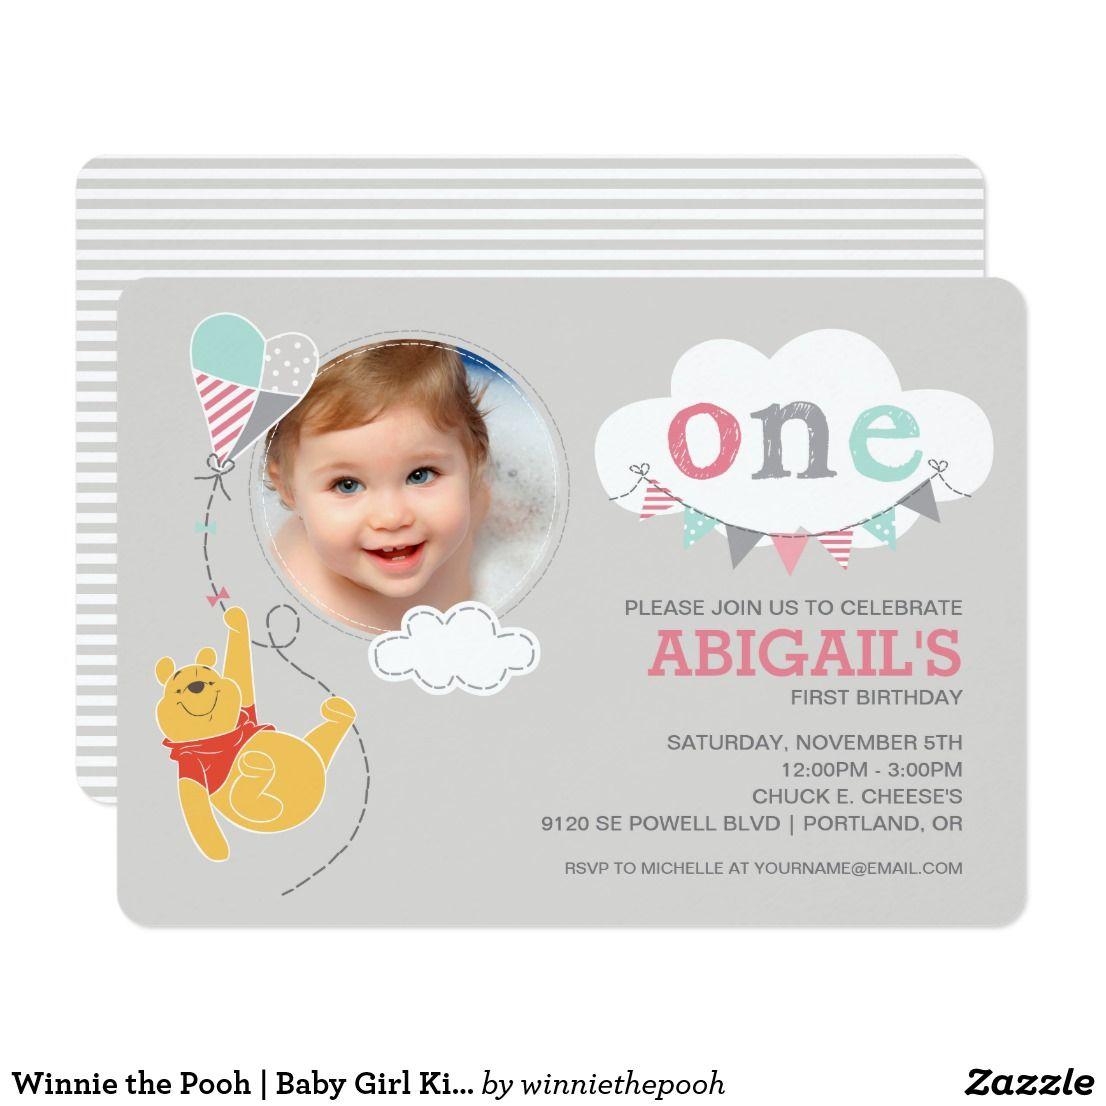 Winnie the Pooh | Baby Girl Kite - First Birthday Invitation ...